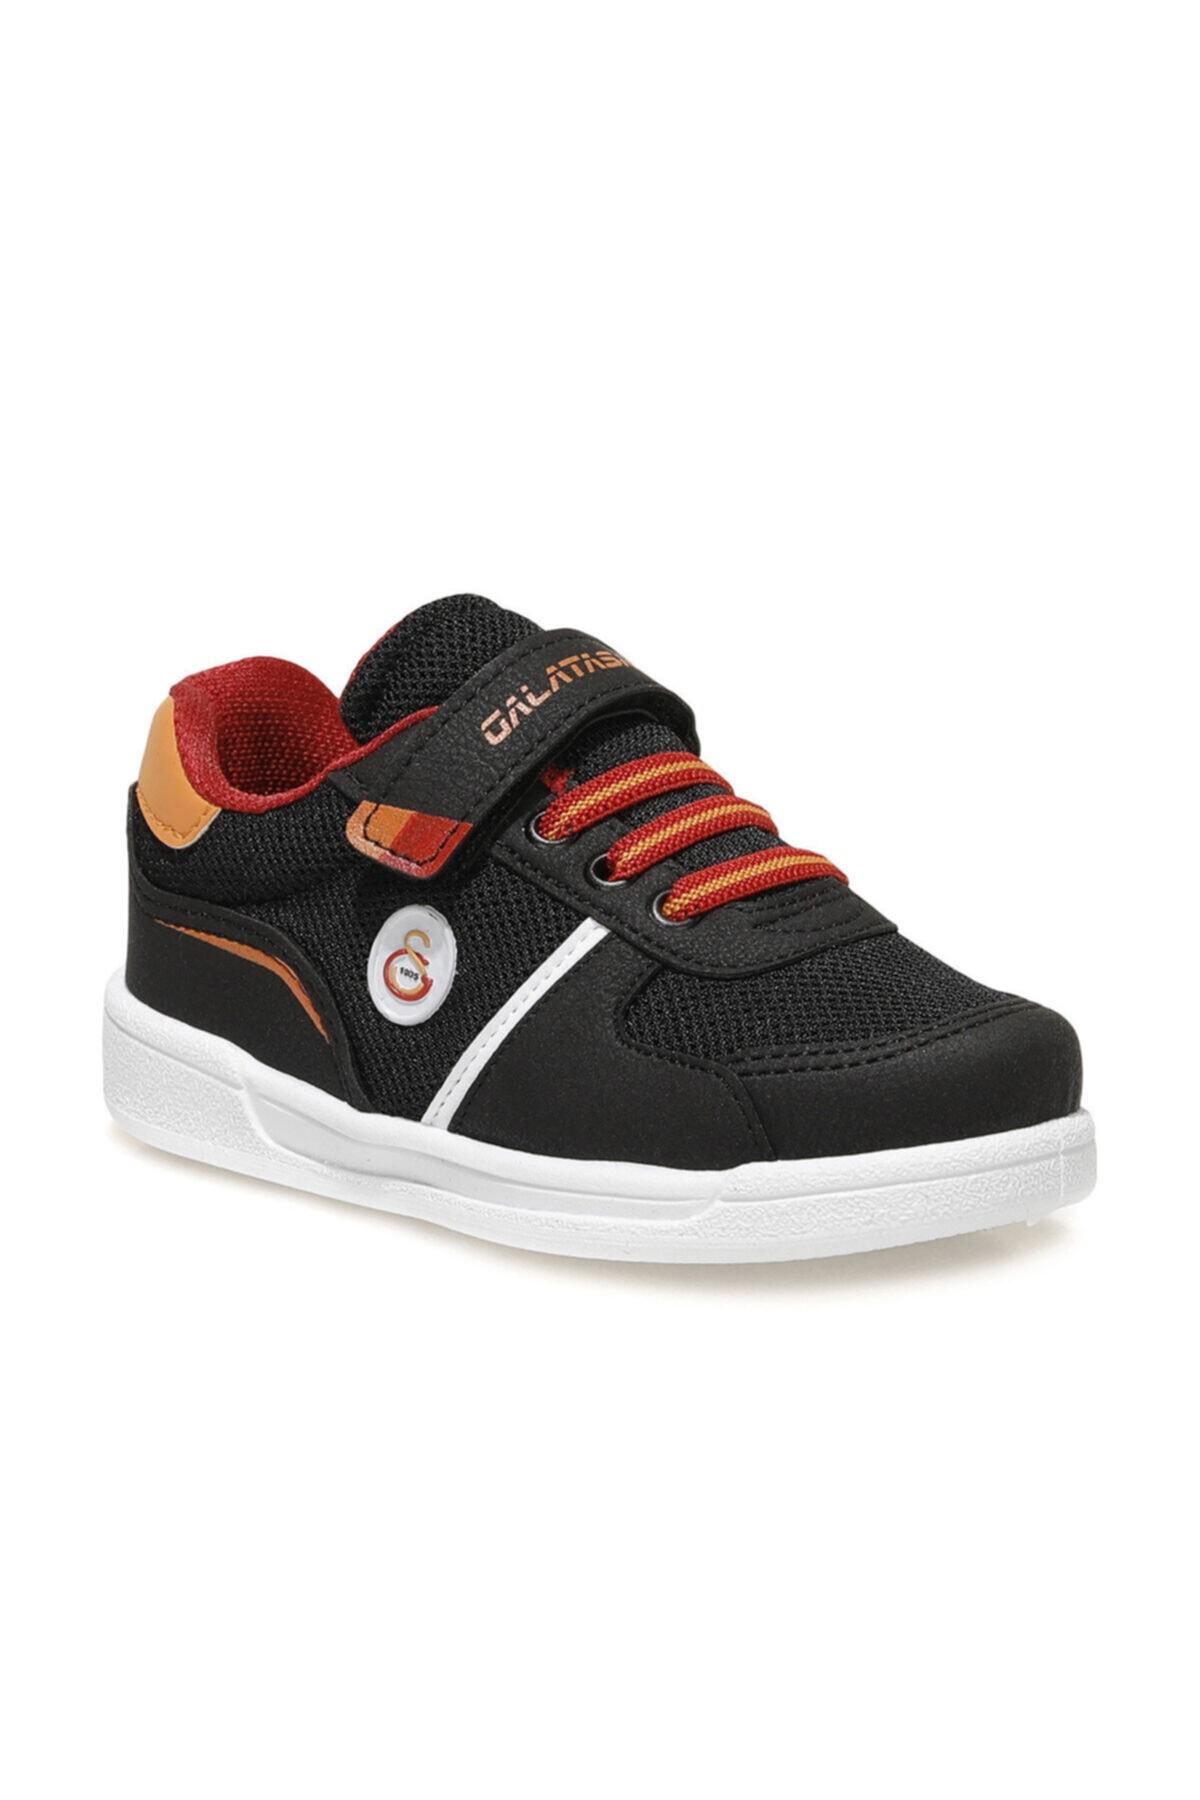 KREJA GS 1FX Siyah Erkek Çocuk Sneaker Ayakkabı 101013814